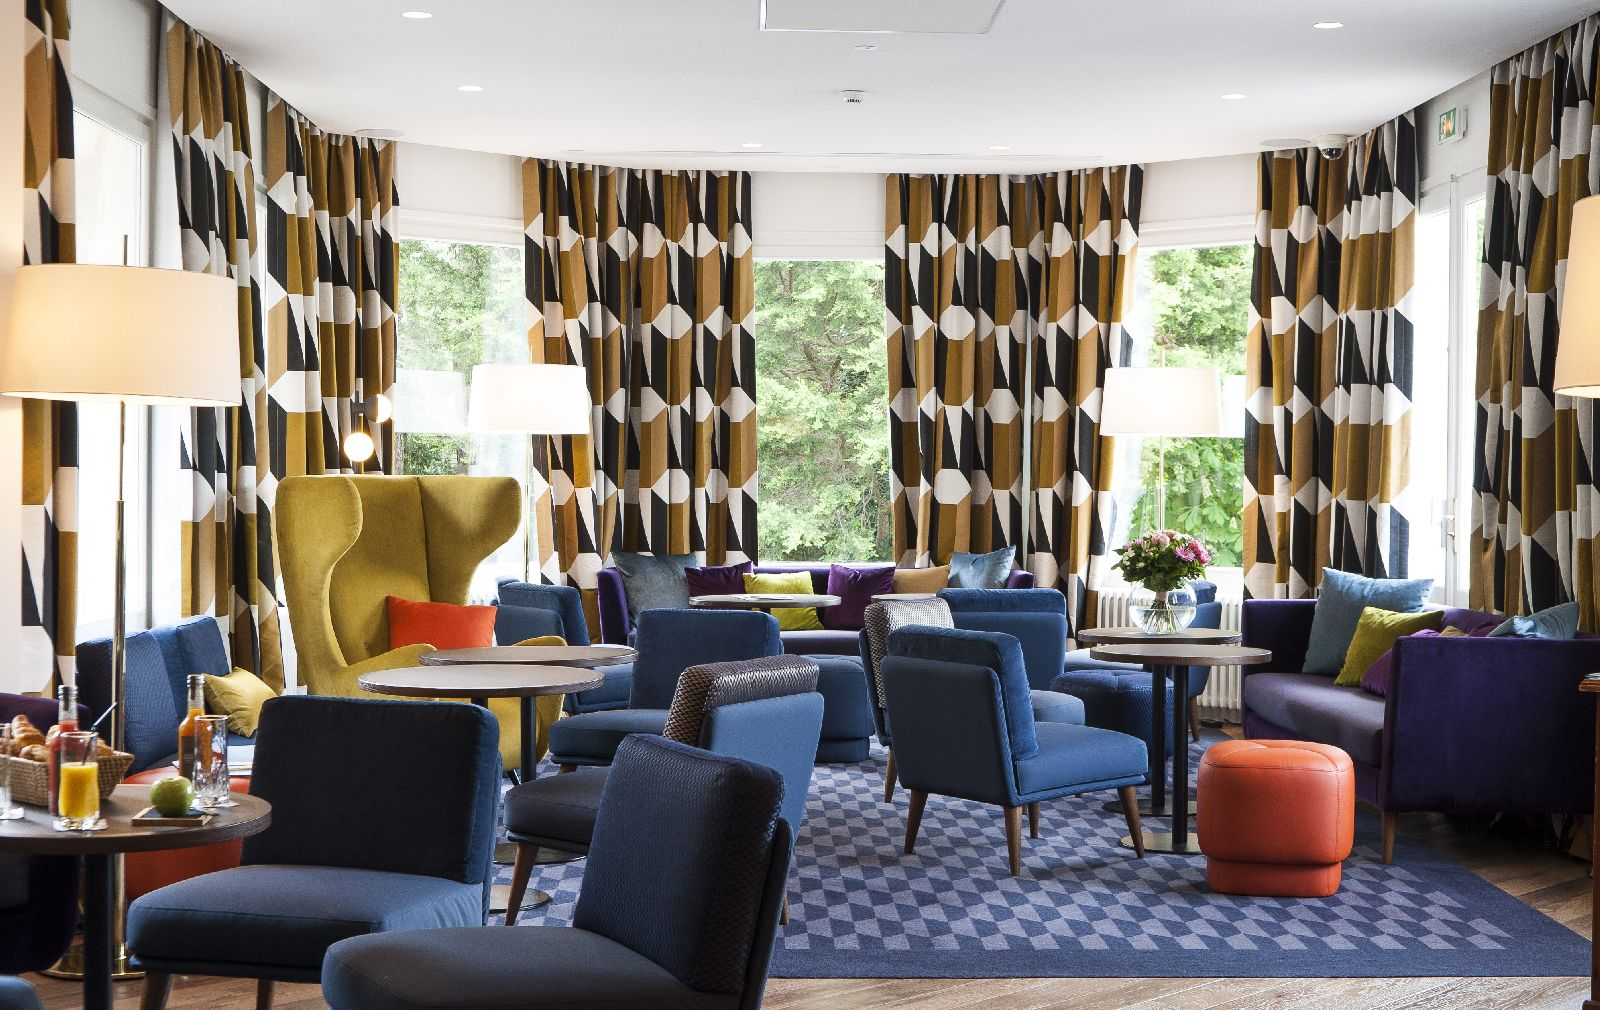 golf-expedition-golf-reizen-frankrijk-regio-pas-de-calais-le-manoir-hotel-lounge.jpg